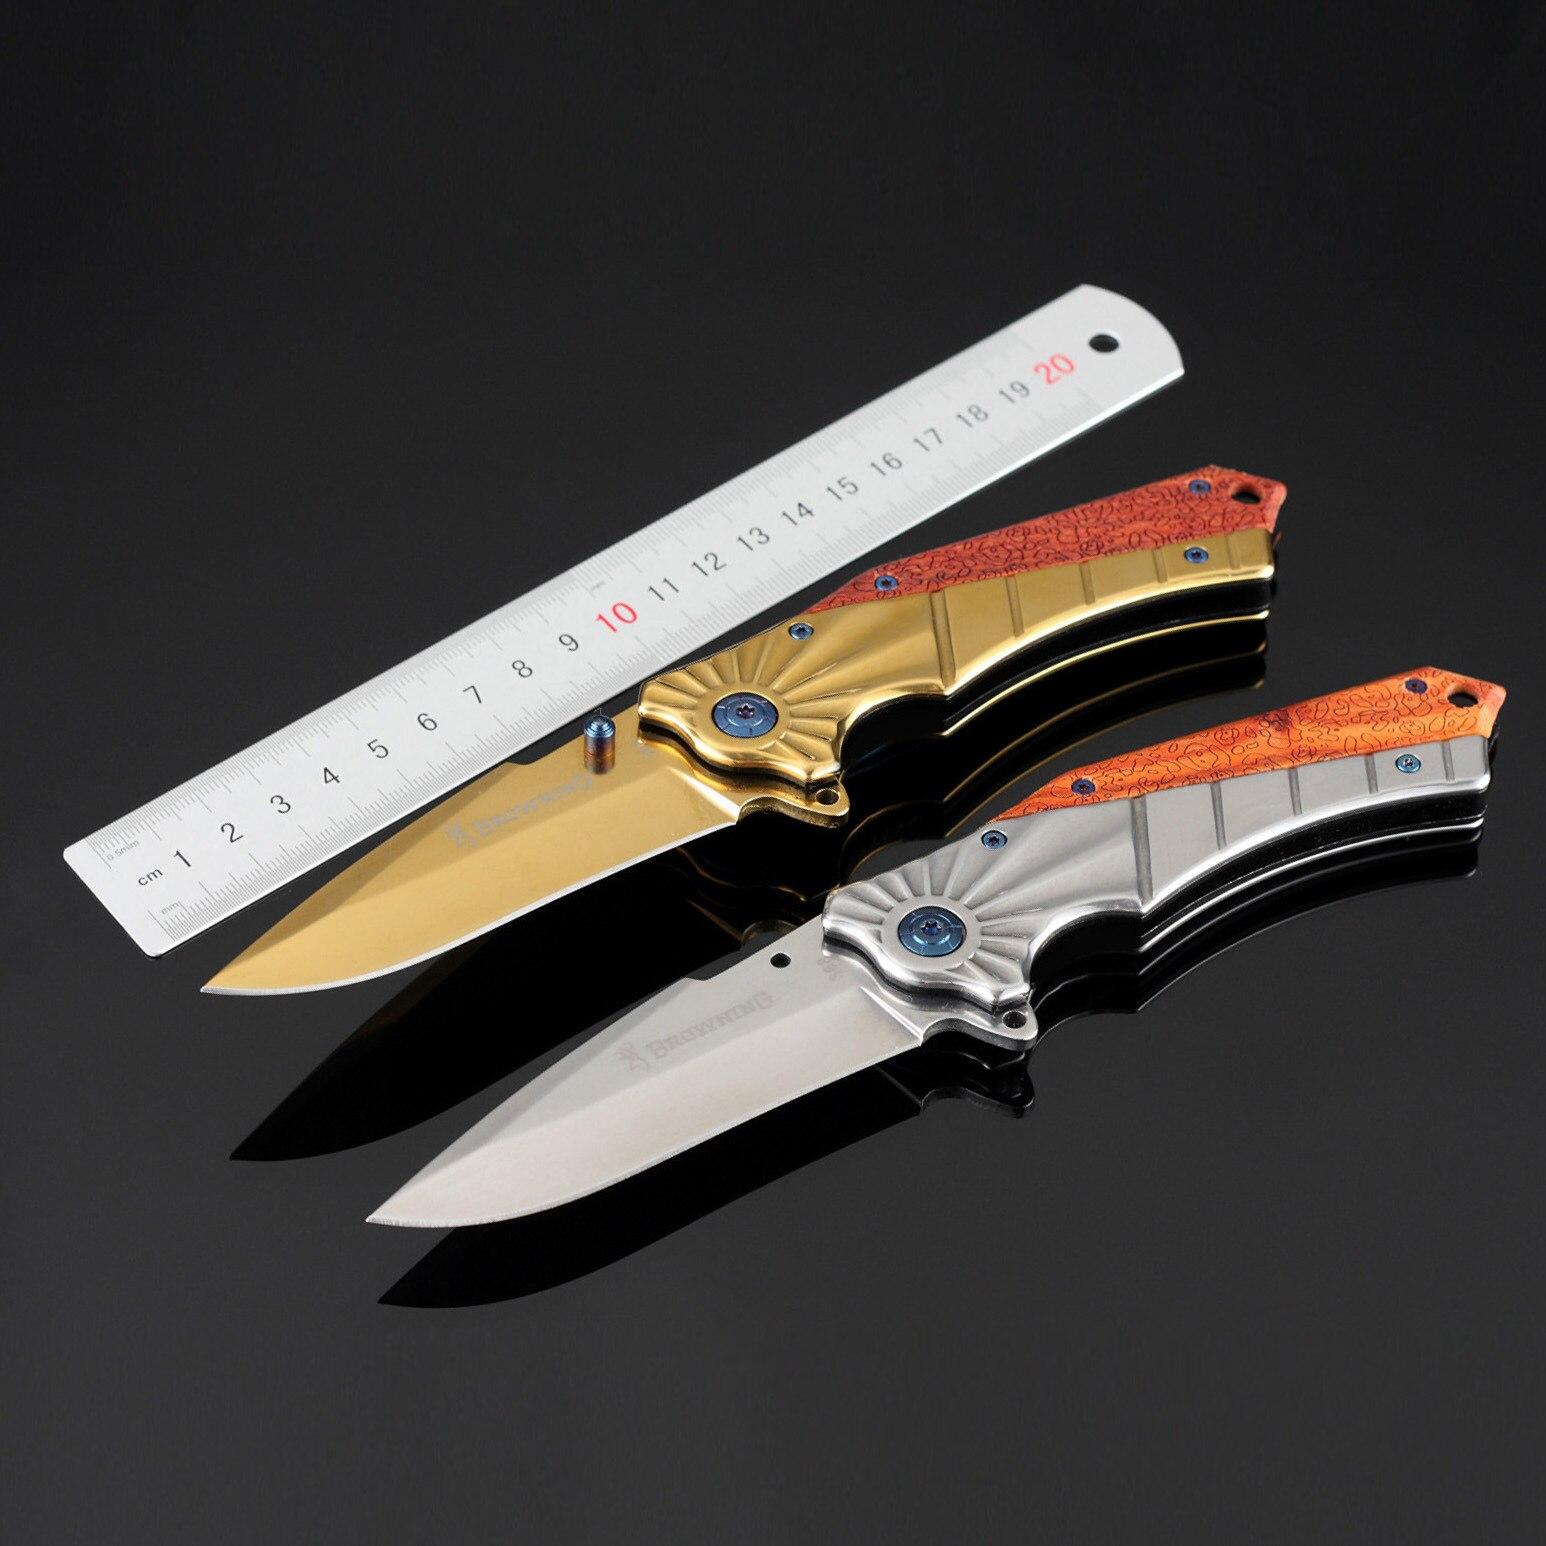 Browning Multifunction font b Tactical b font Pocket Folding font b Knife b font 7CR17 Steel